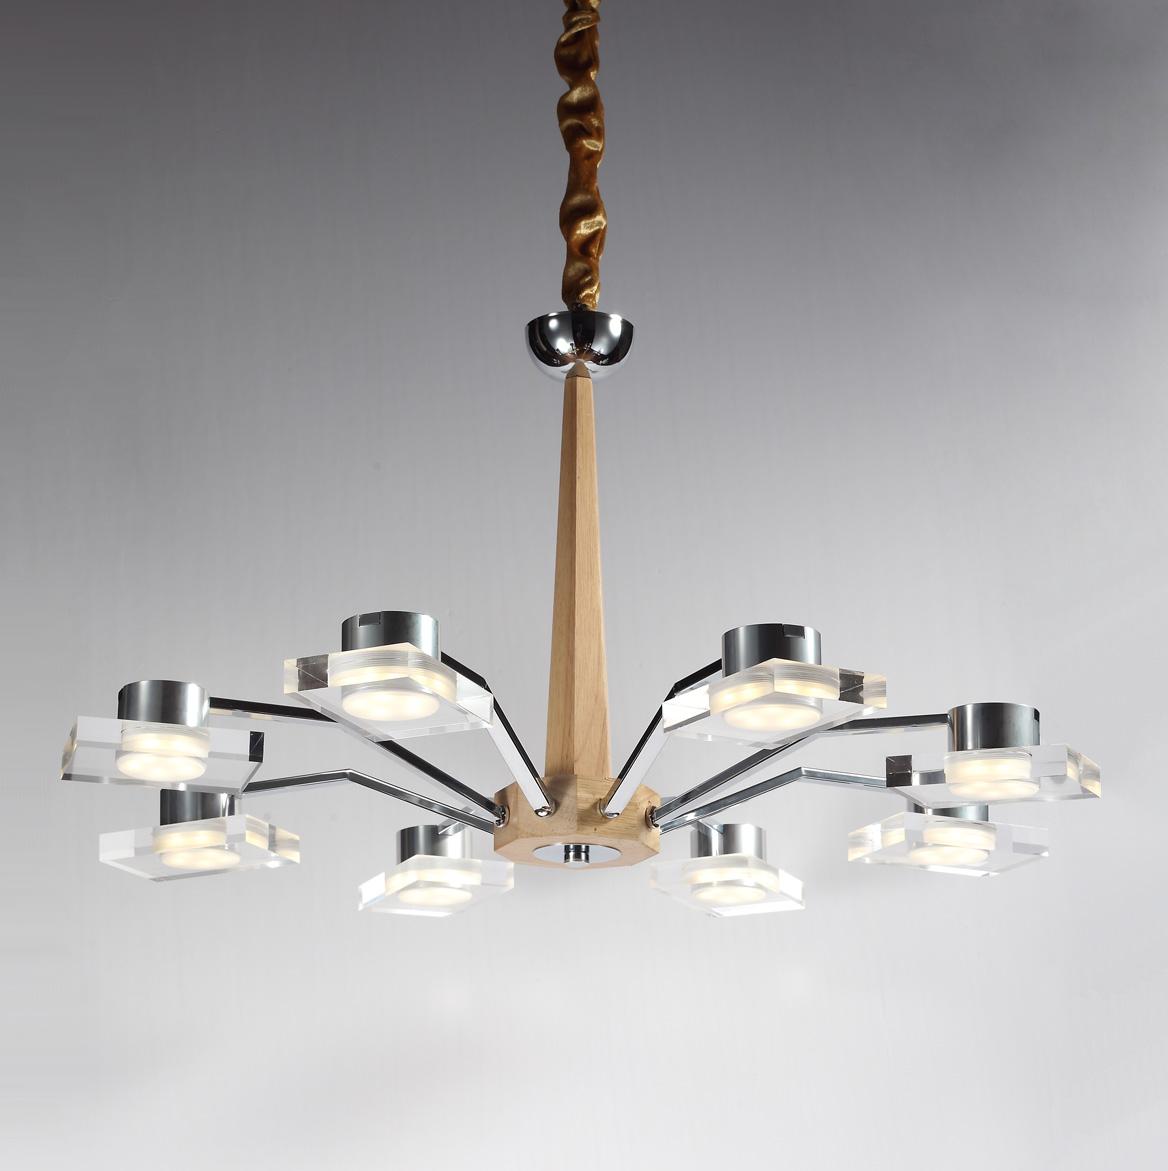 Люстра NaturaЛюстры подвесные<br>&amp;lt;div&amp;gt;&amp;lt;span style=&amp;quot;font-size: 14px;&amp;quot;&amp;gt;Вид цоколя: LED&amp;lt;/span&amp;gt;&amp;lt;br&amp;gt;&amp;lt;/div&amp;gt;&amp;lt;div&amp;gt;Мощность: &amp;amp;nbsp;5W&amp;amp;nbsp;&amp;lt;/div&amp;gt;&amp;lt;div&amp;gt;Количество ламп: 8&amp;lt;/div&amp;gt;<br><br>Material: Дерево<br>Height см: 81<br>Diameter см: 66